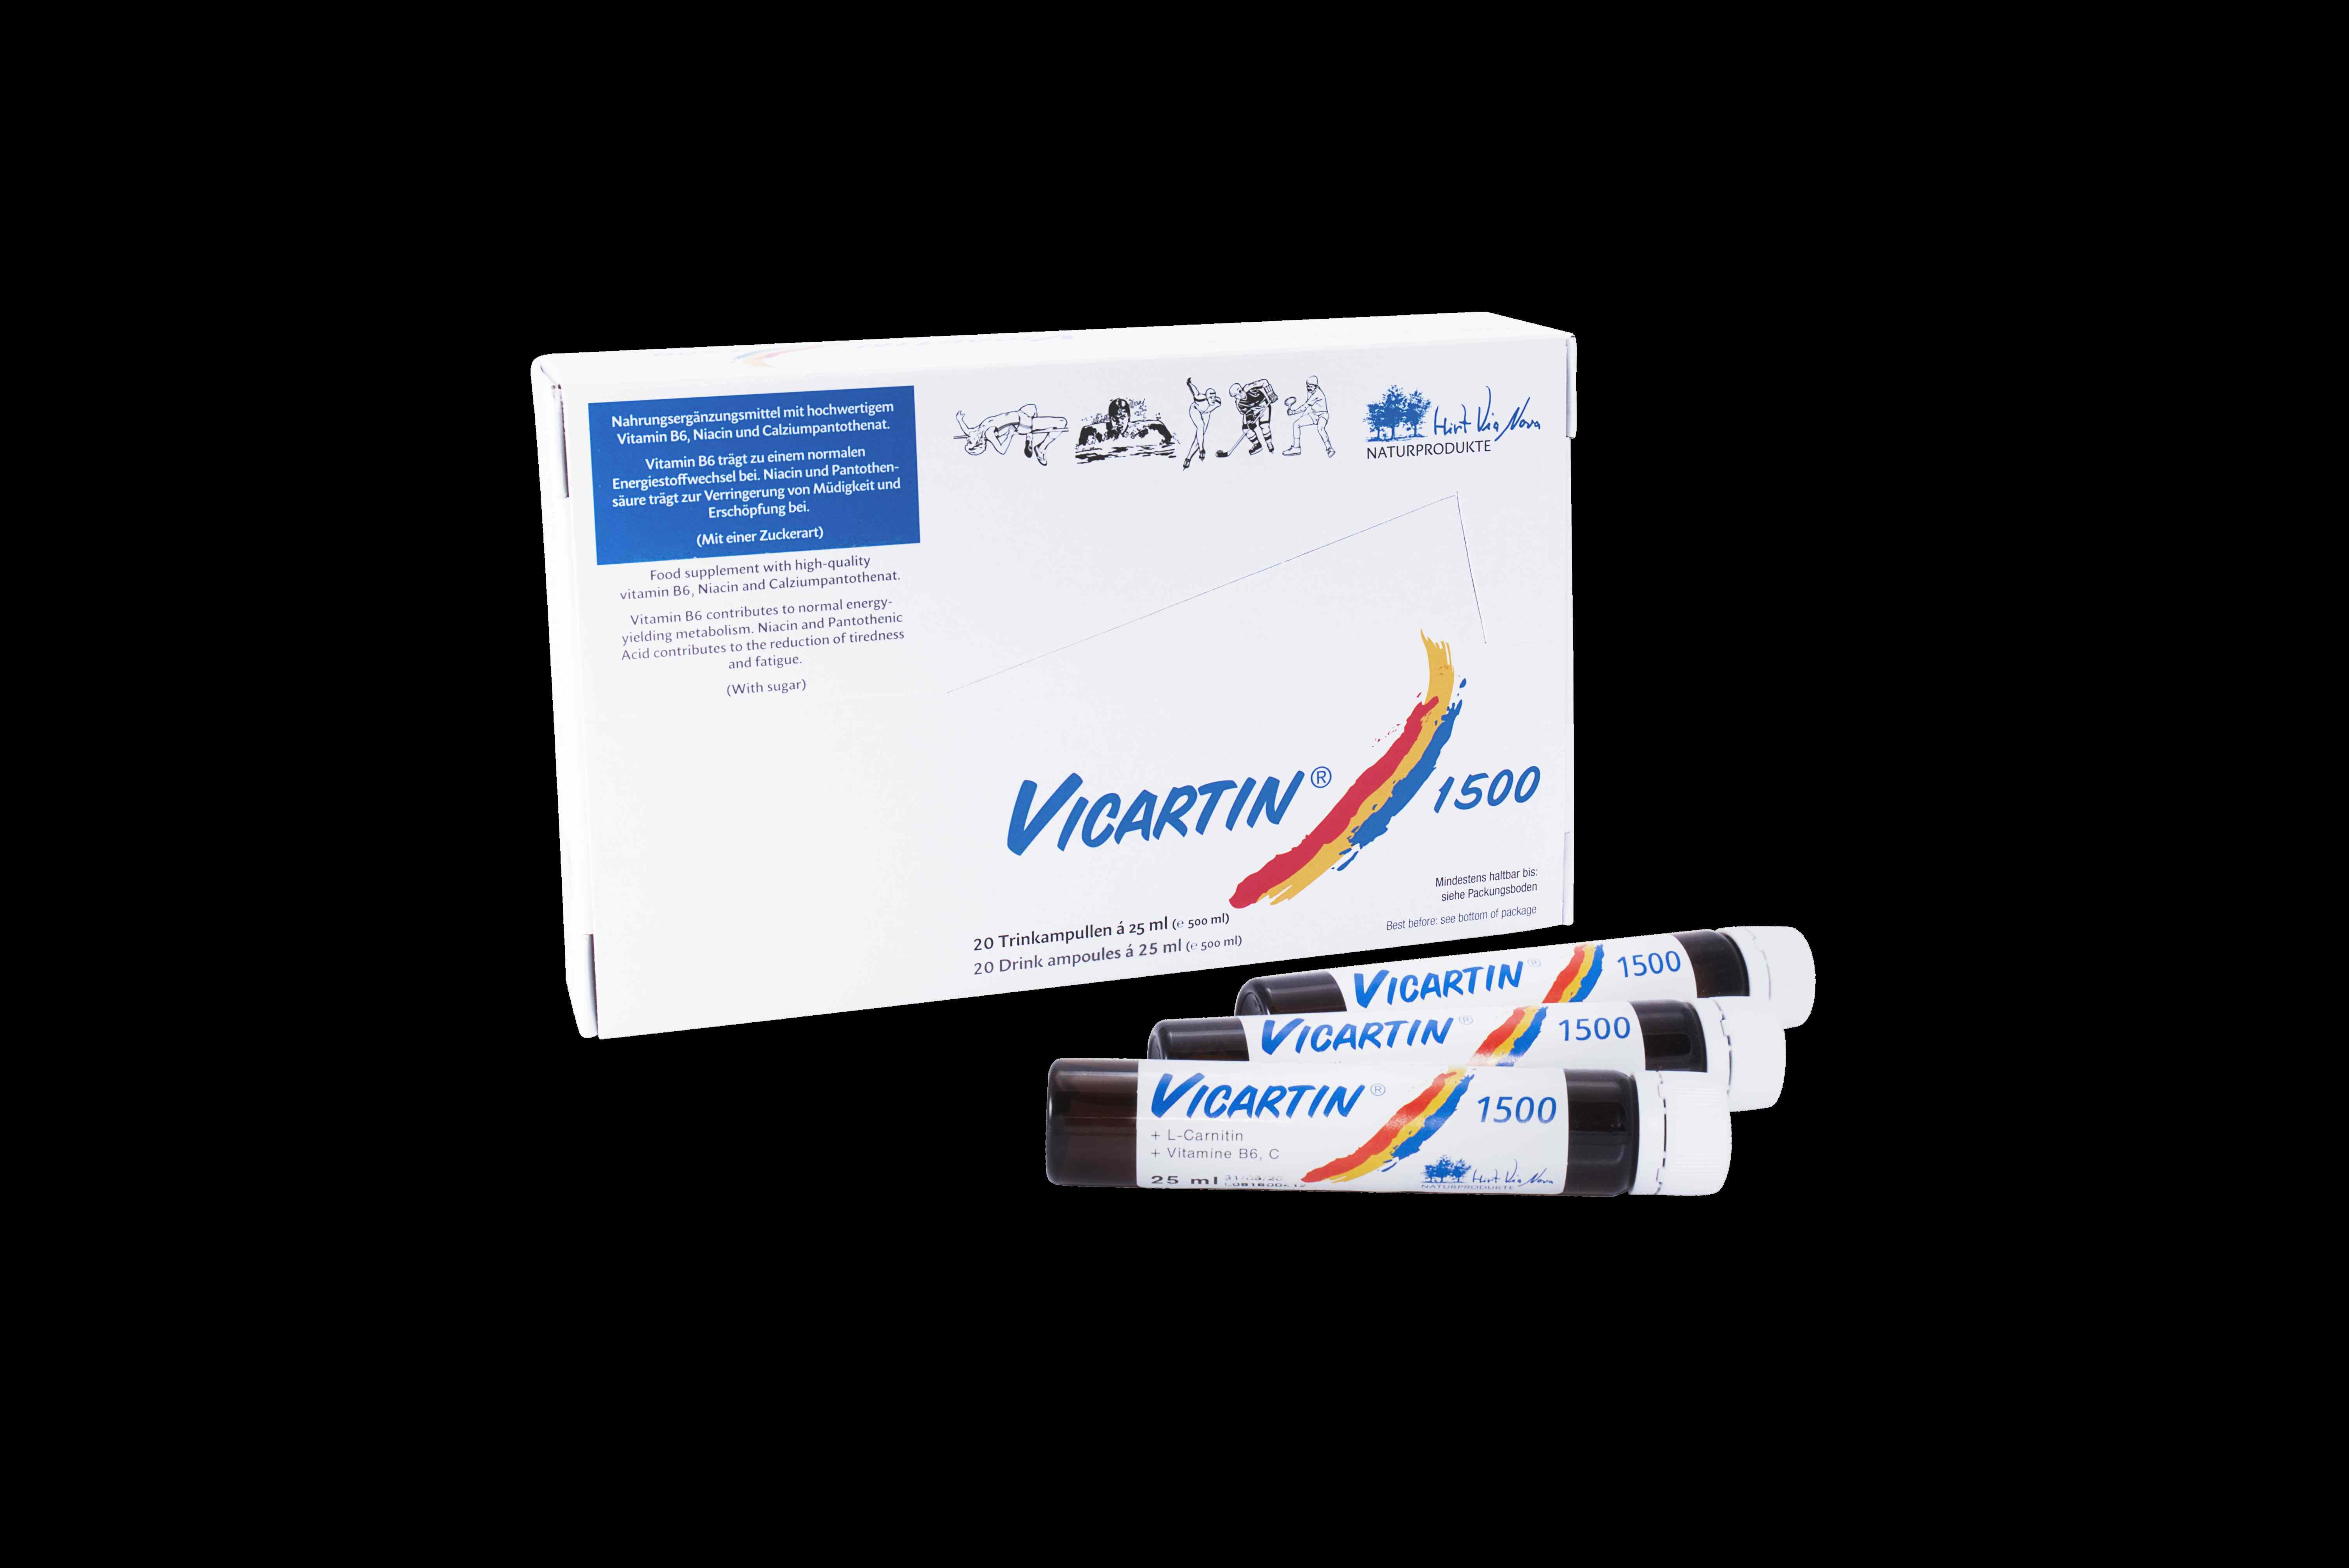 Vicartin 1500 - Trinkampullenkur zur Stärkung des Immunsystems